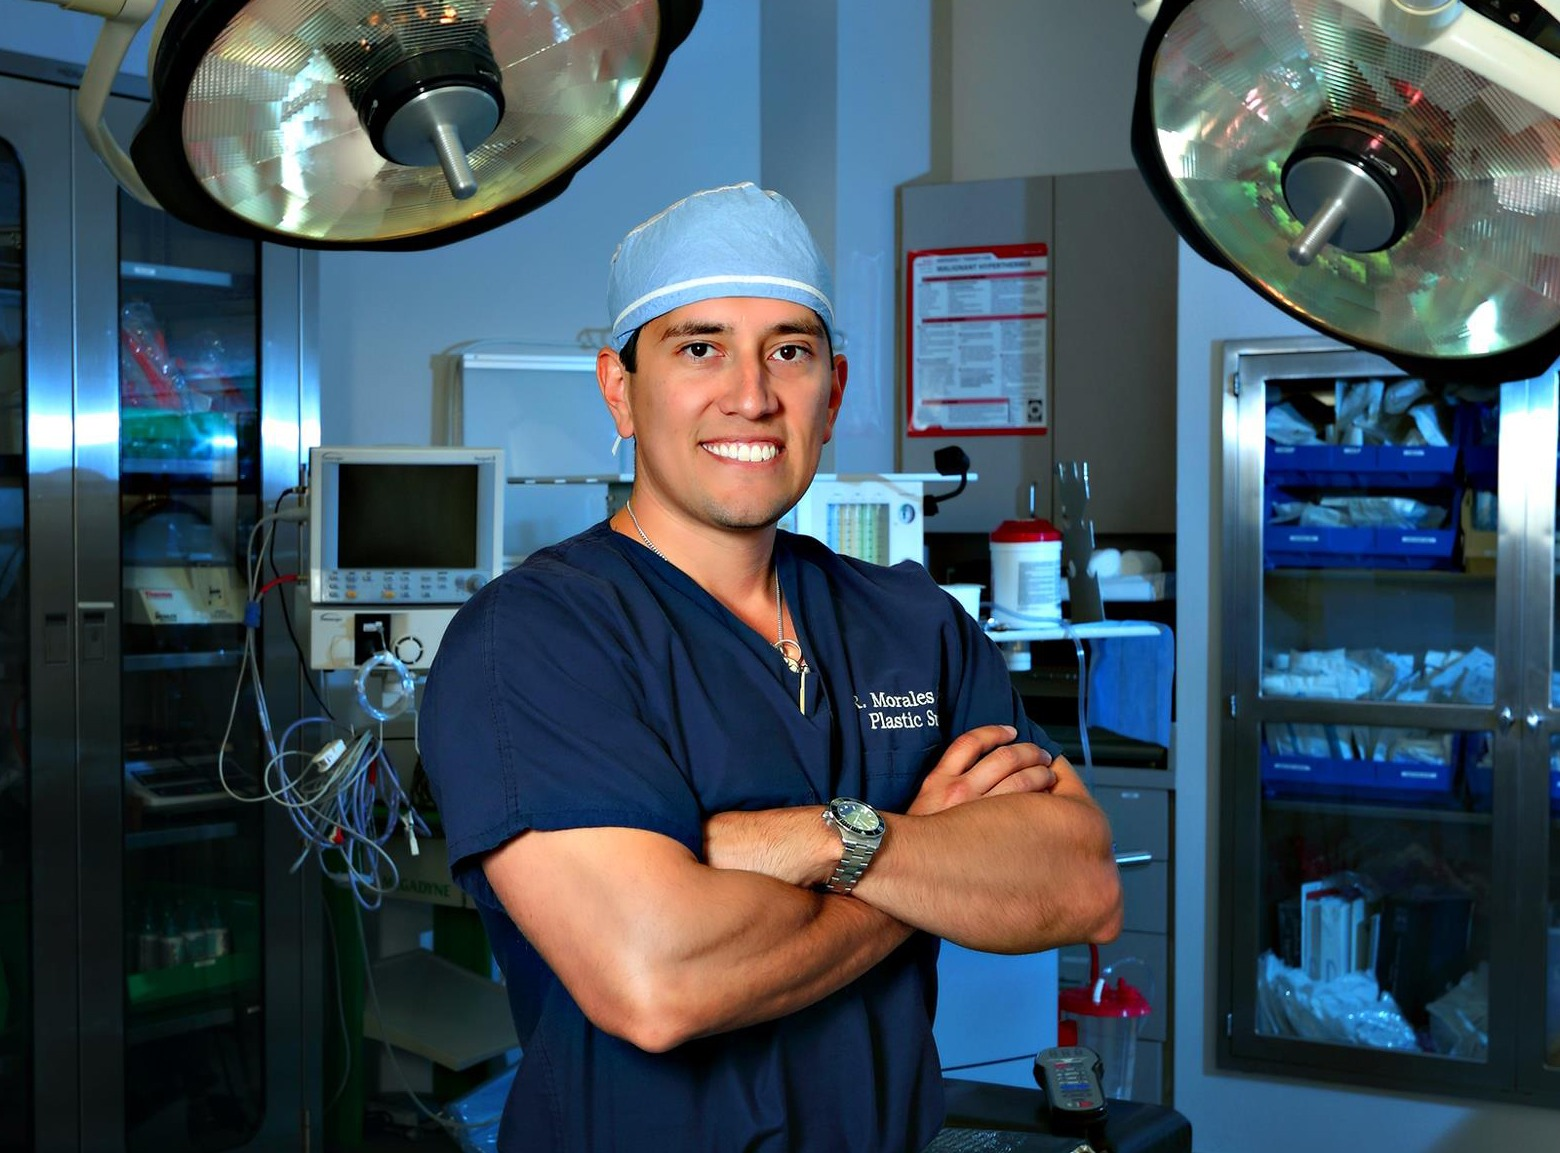 Meet Dr Morales Plastic Surgeon Liposuction Breast